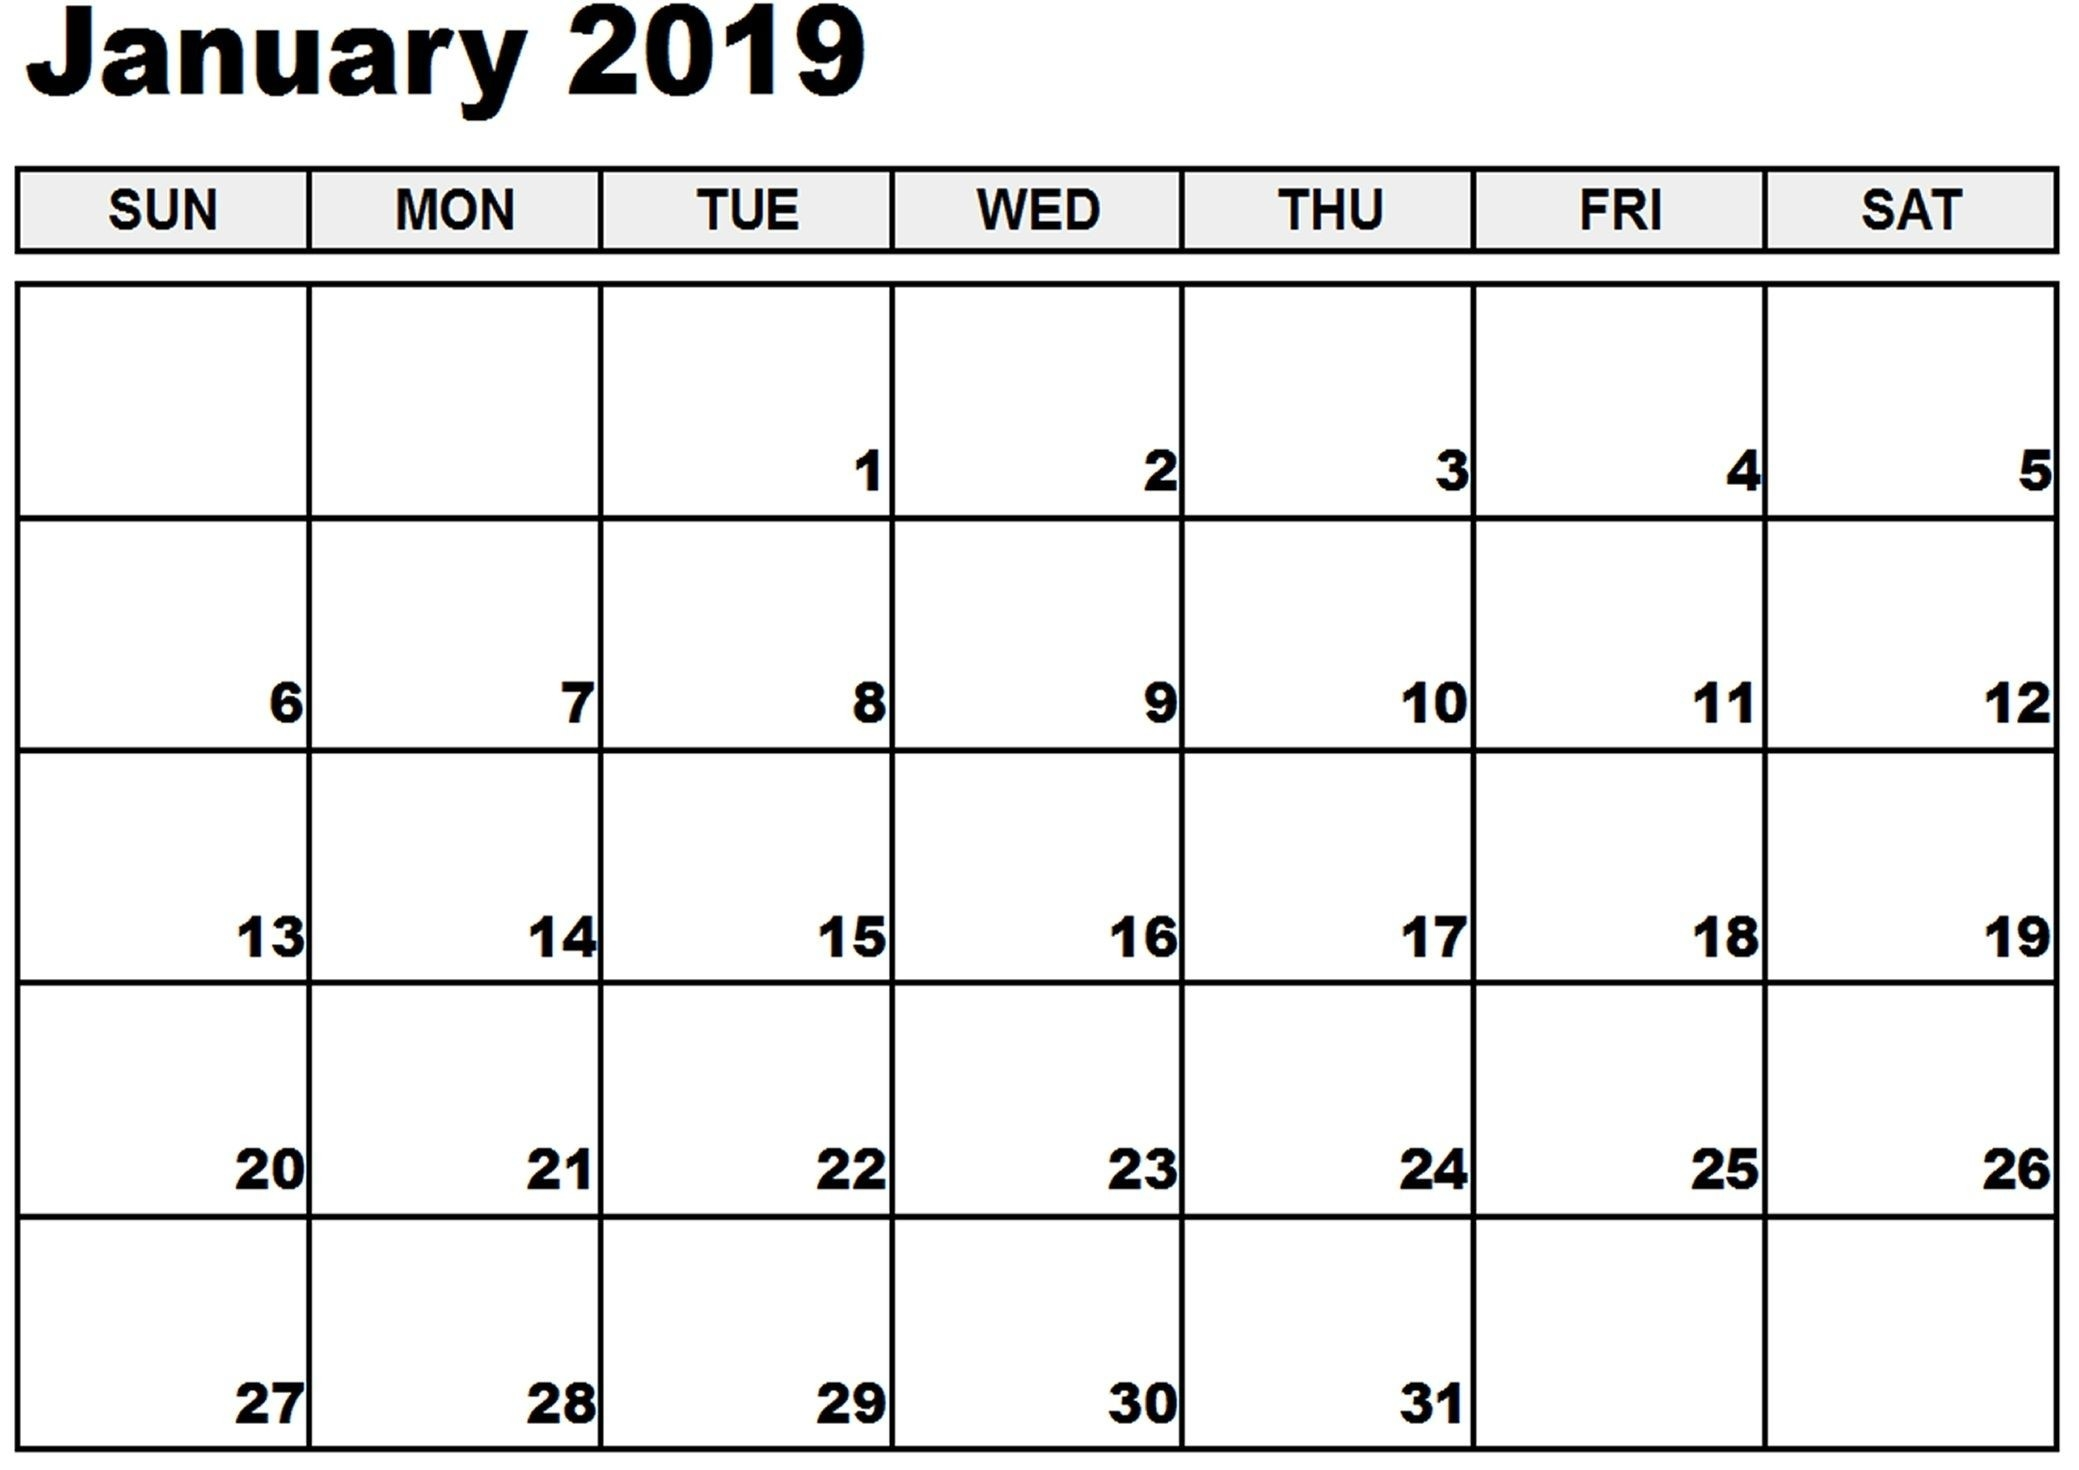 January 2019 Printable Calendar January 2019 Calendar-Blank Month Caledar Uk